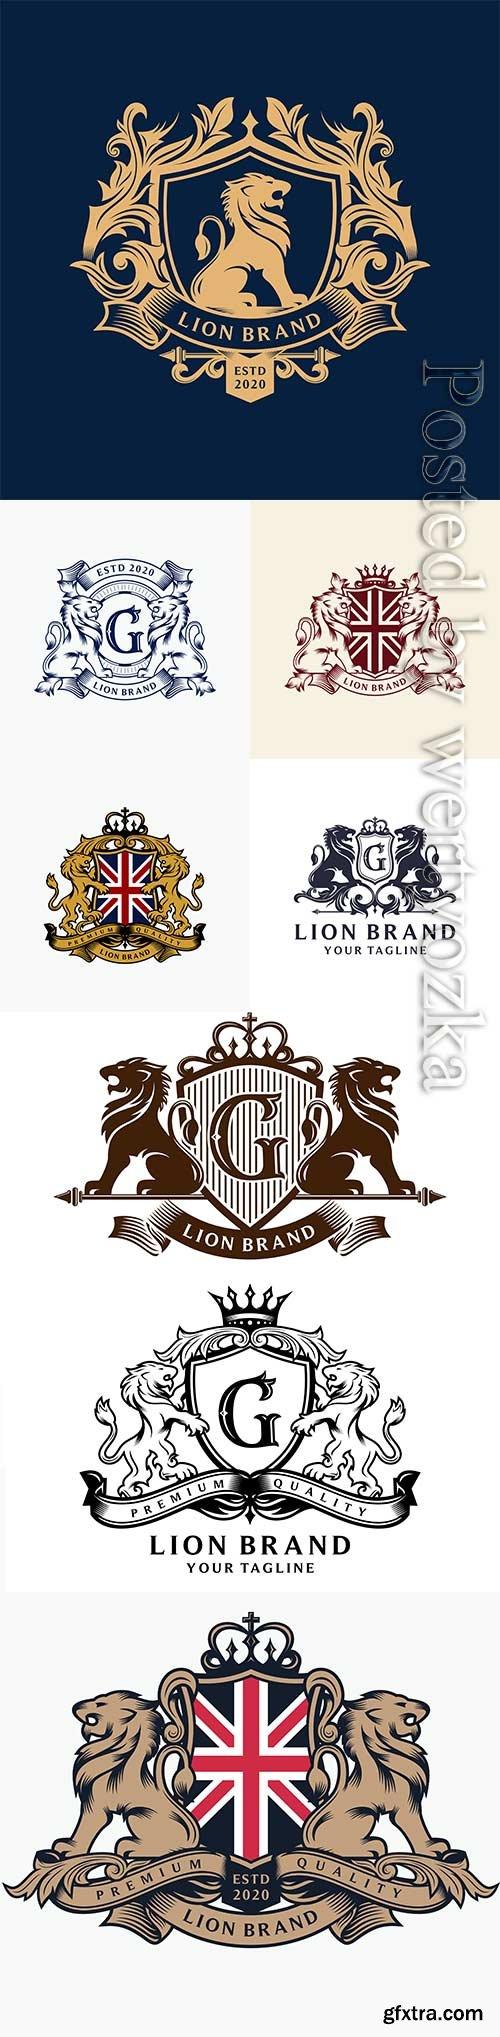 Heraldry lion brand logo design premium vector